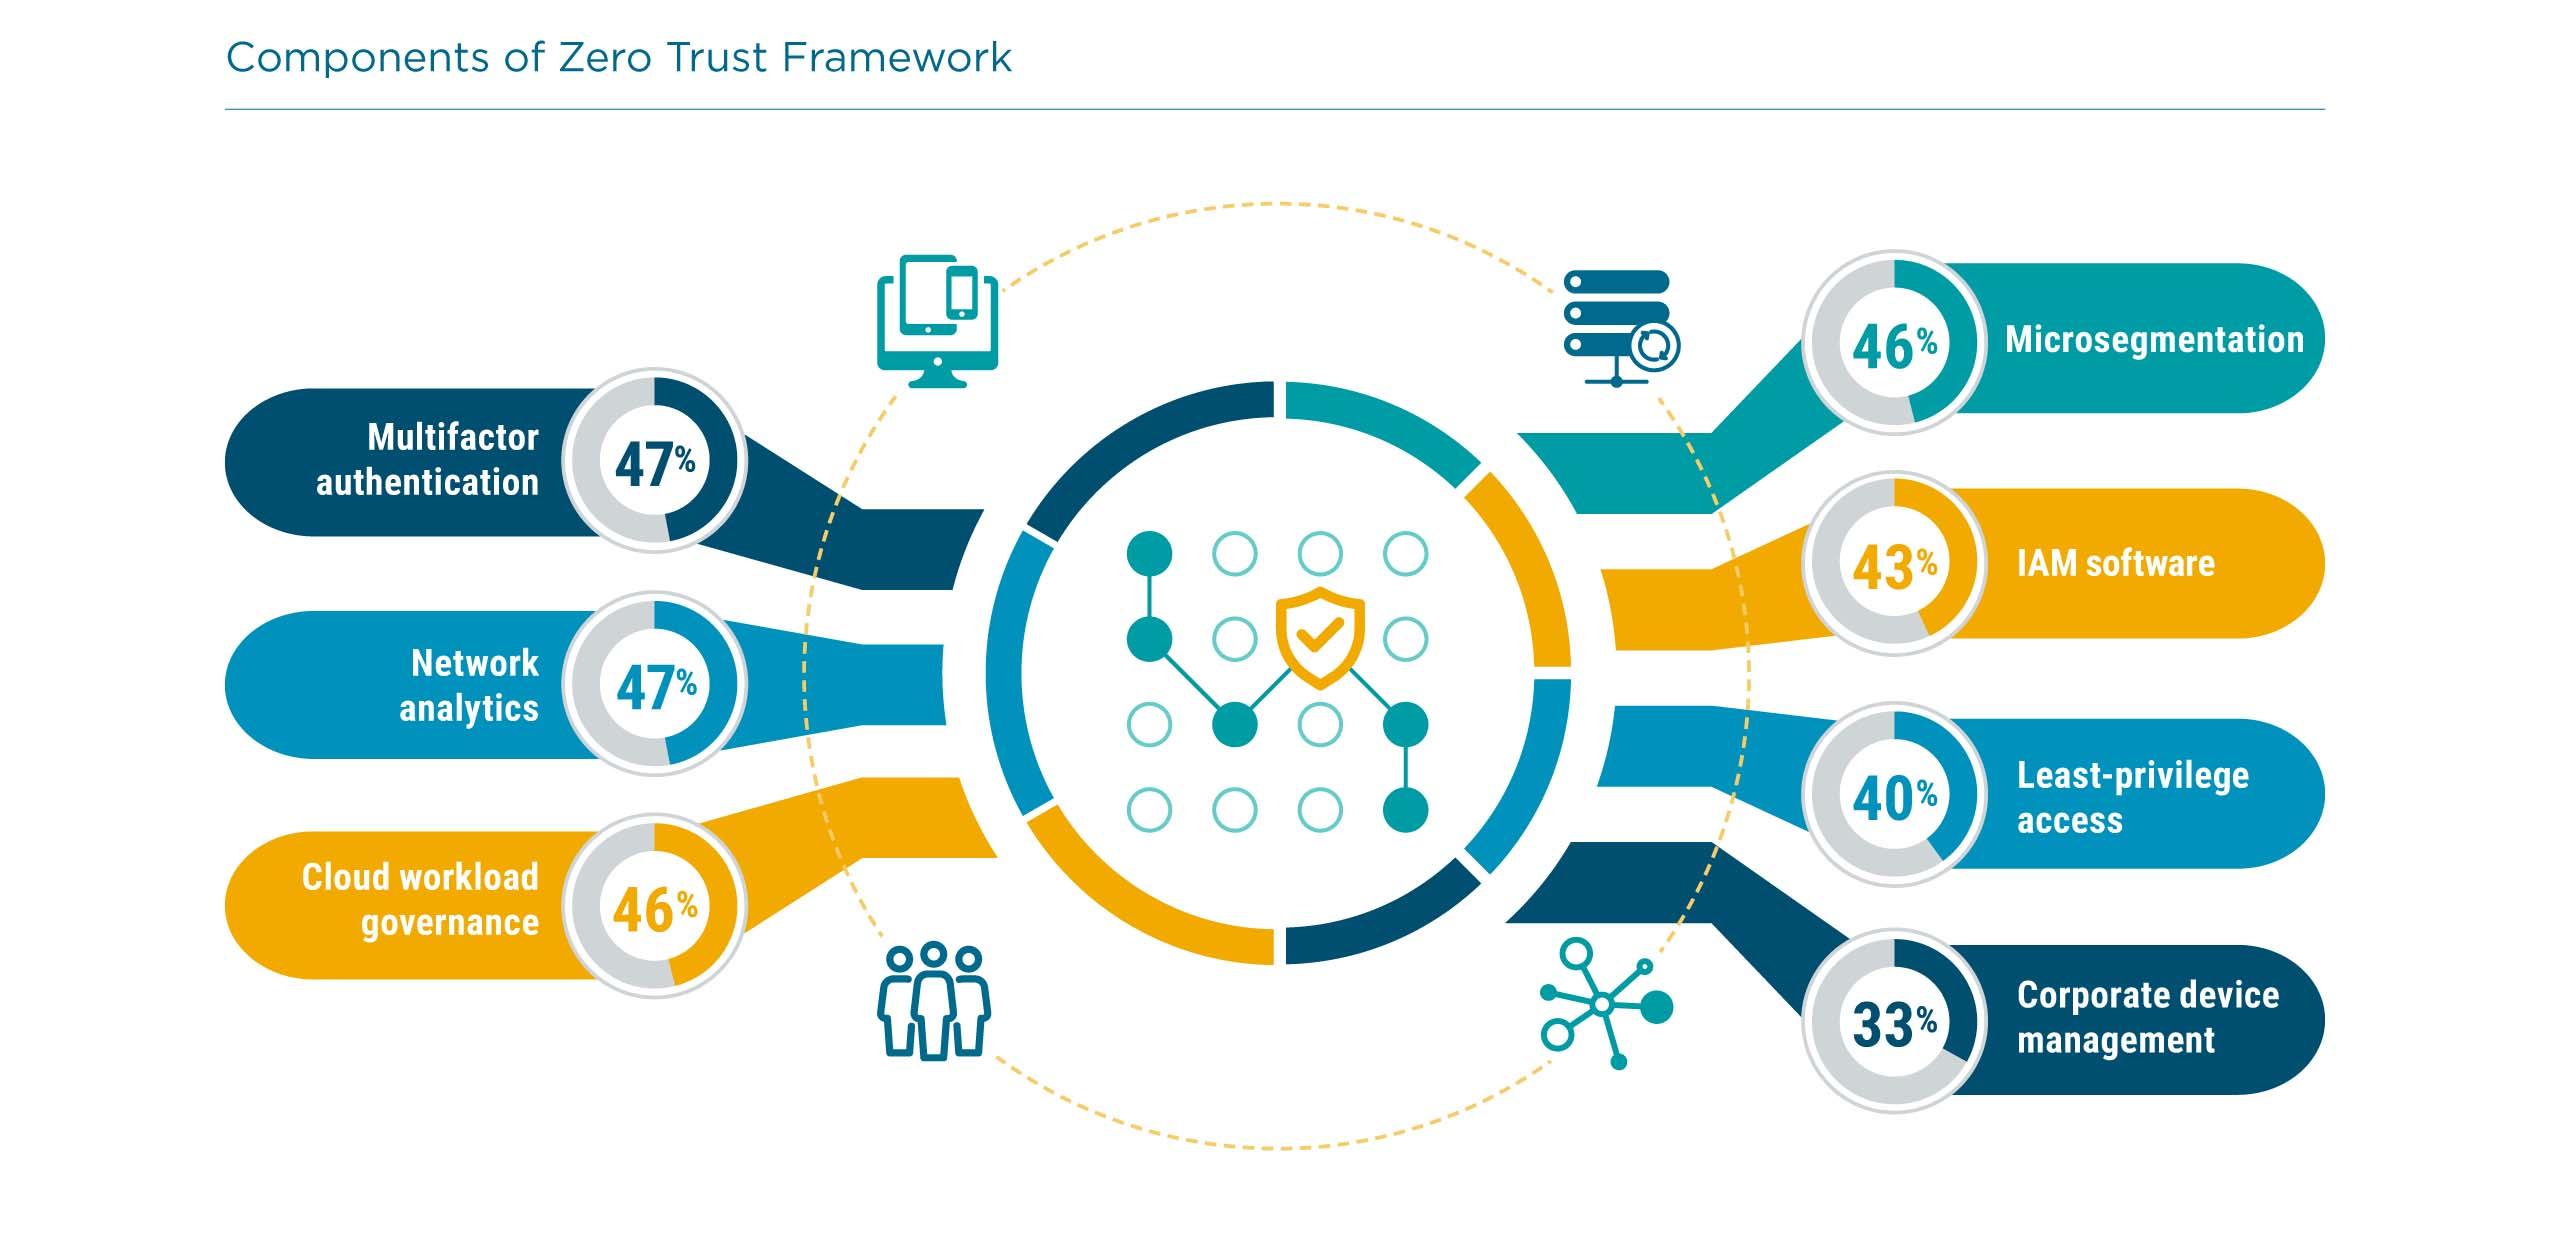 Components of Zero Trust Framework